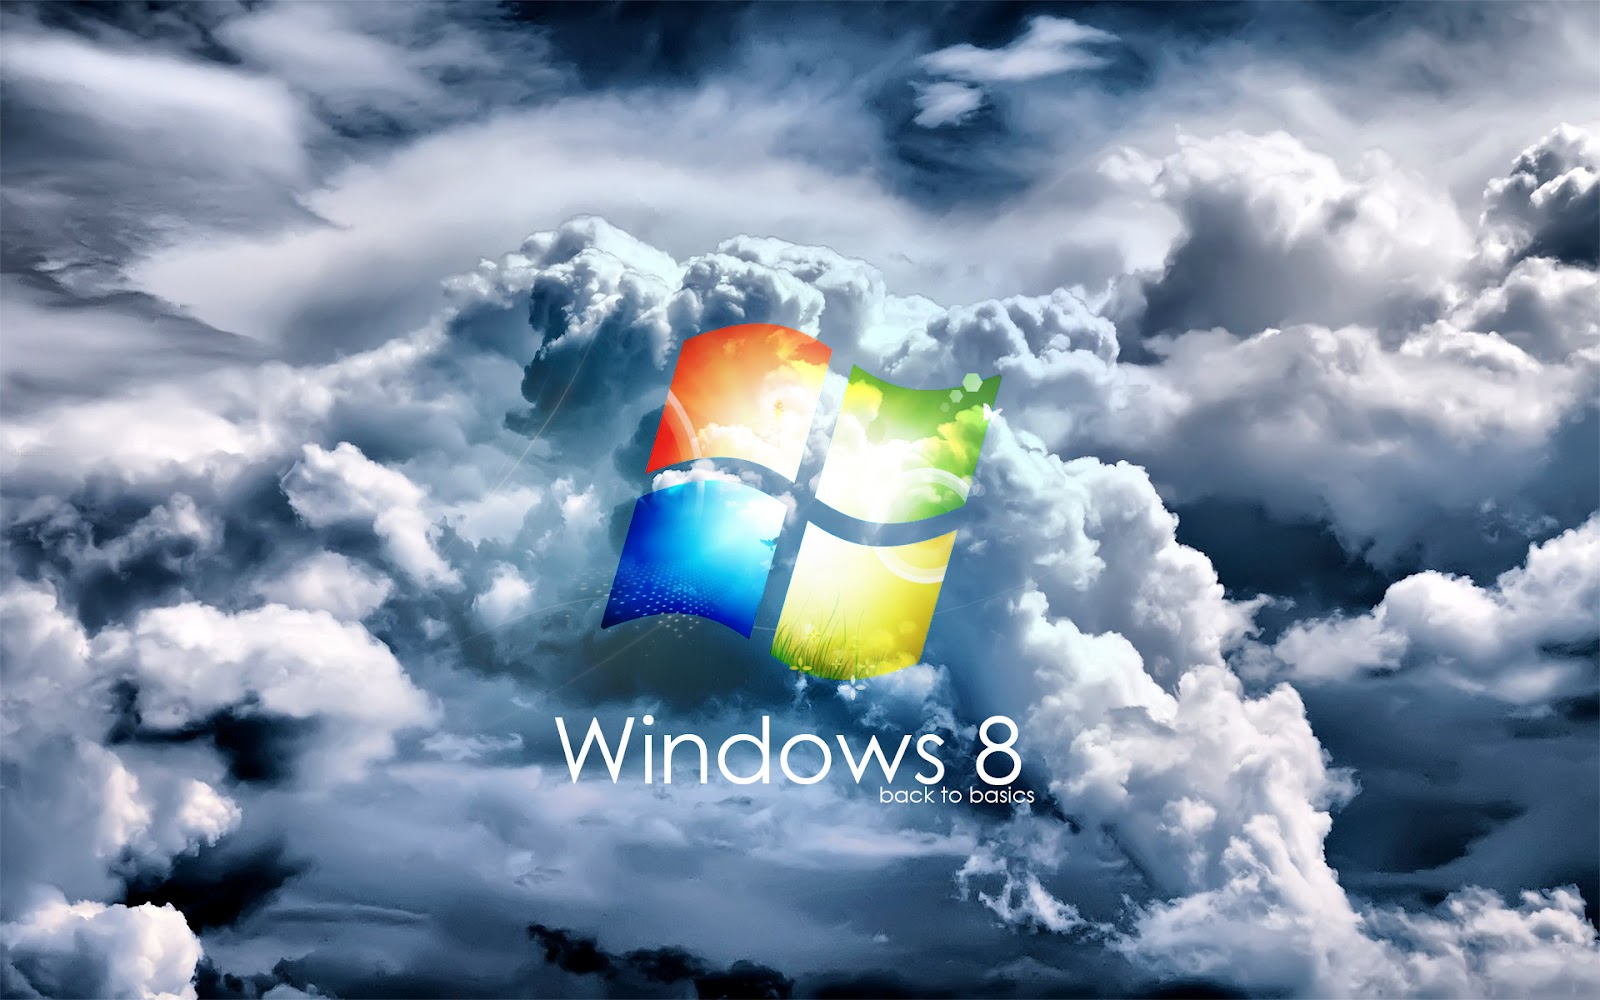 http://3.bp.blogspot.com/-9uSmGgZw6CY/UEw59dRJWCI/AAAAAAAABQM/UFlbPCttjRk/s1600/Windows8+hd+Wallpapers+2012+09.jpg